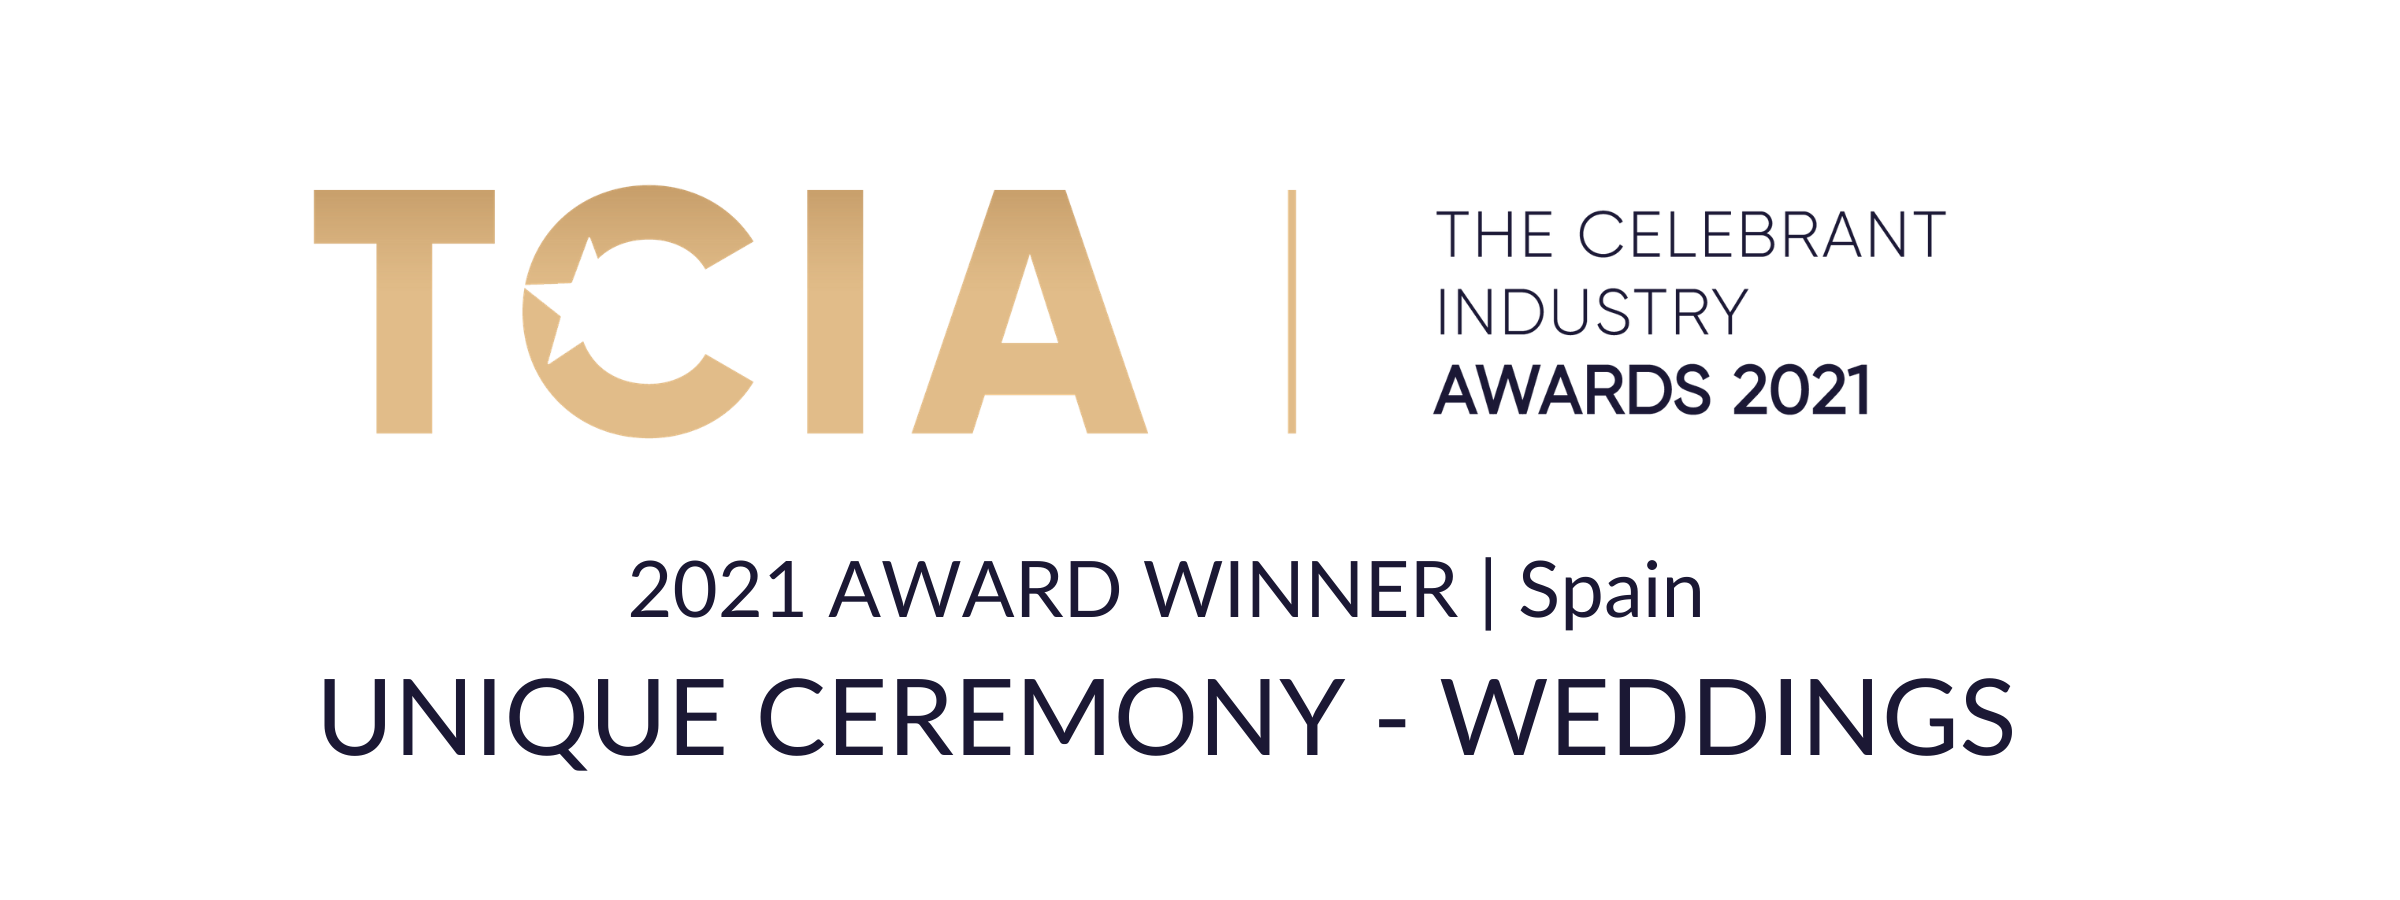 Most Unique Ceremony in Spain Award 2021